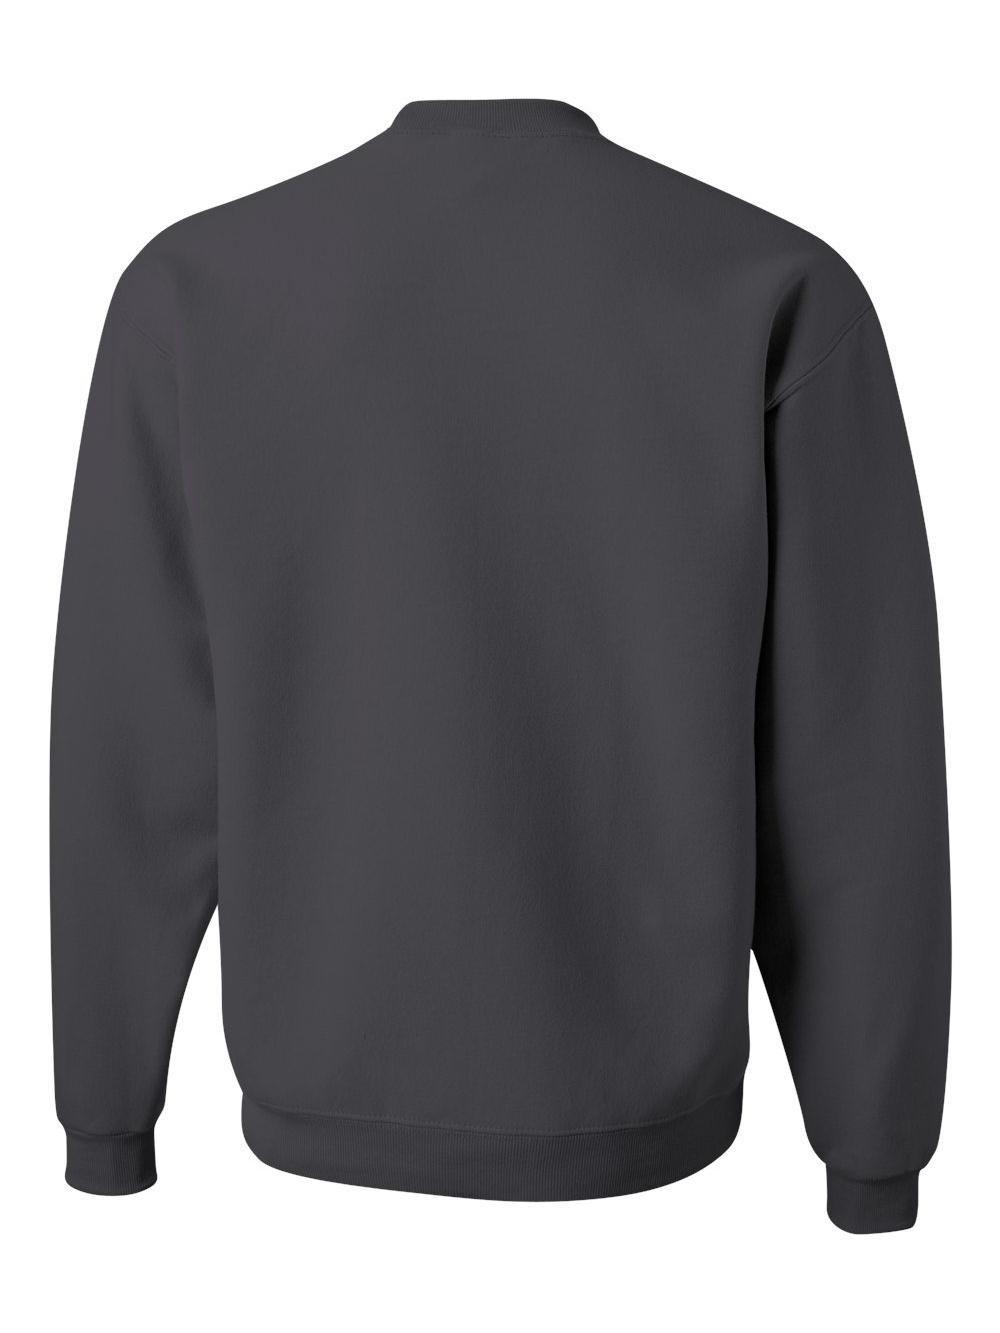 Jerzees-NuBlend-Crewneck-Sweatshirt-562MR thumbnail 22